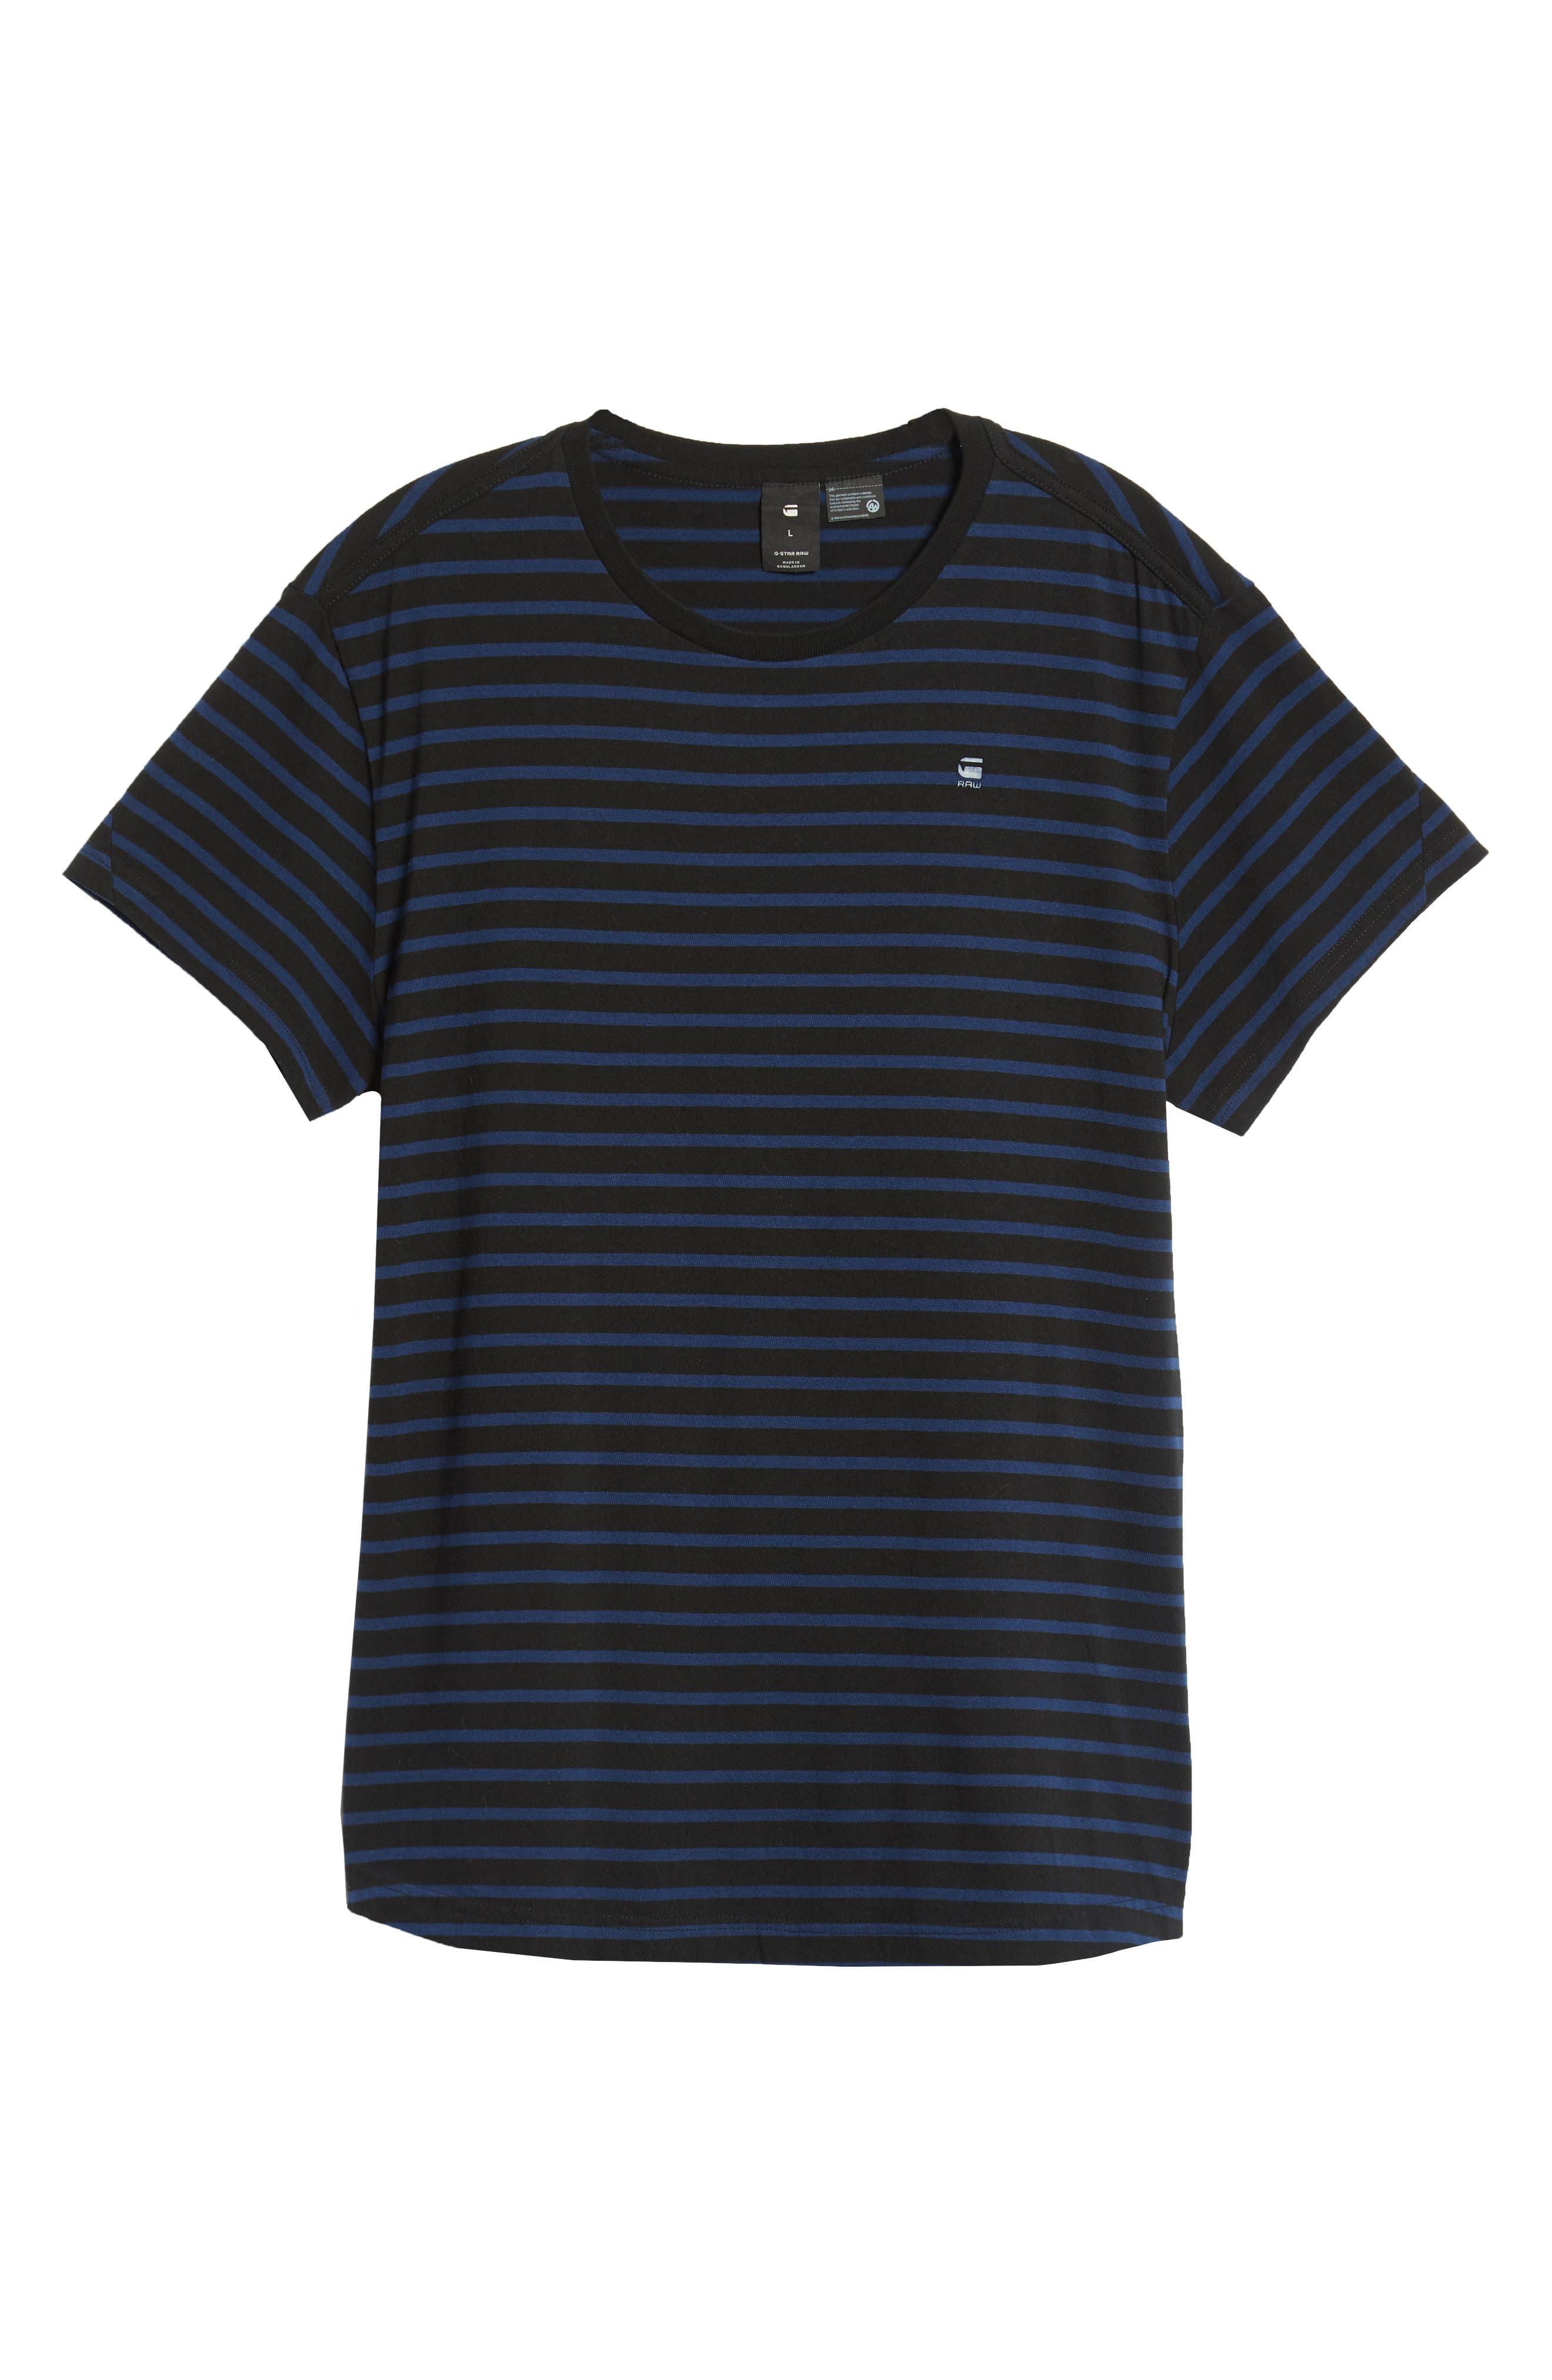 Starkon Stripe T-Shirt,                             Alternate thumbnail 6, color,                             DARK BLACK/ IMPERIAL BLUE